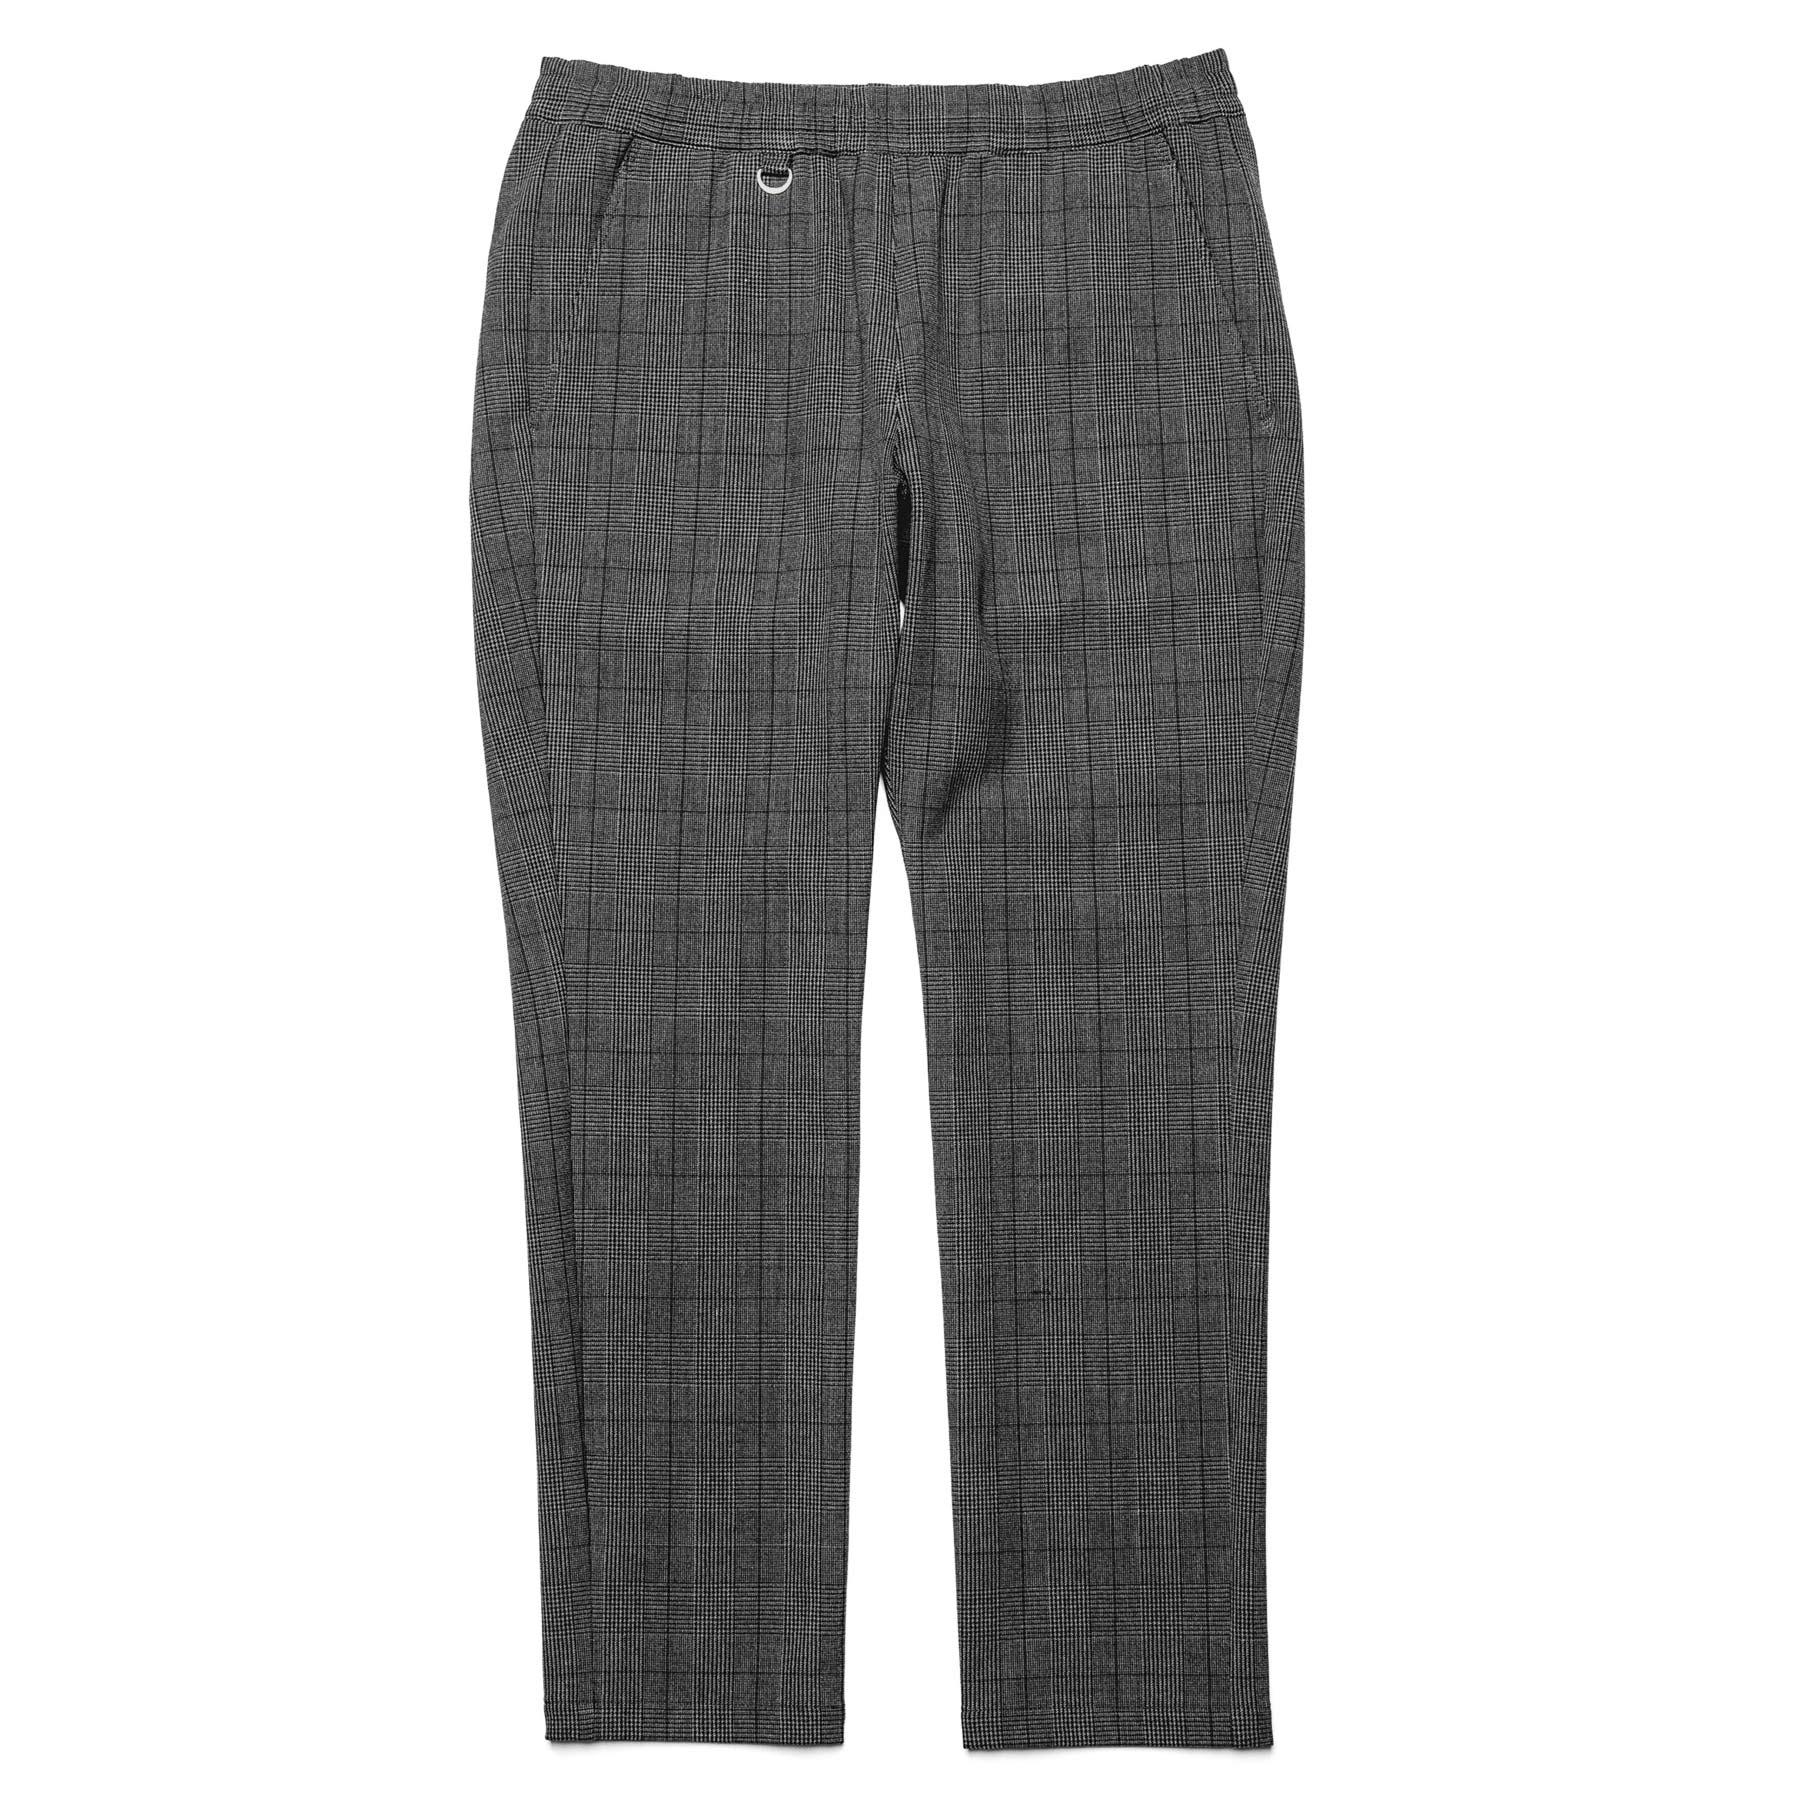 uniform experiment / SLIM FIT CHECK EASY SLACKS -GRAY